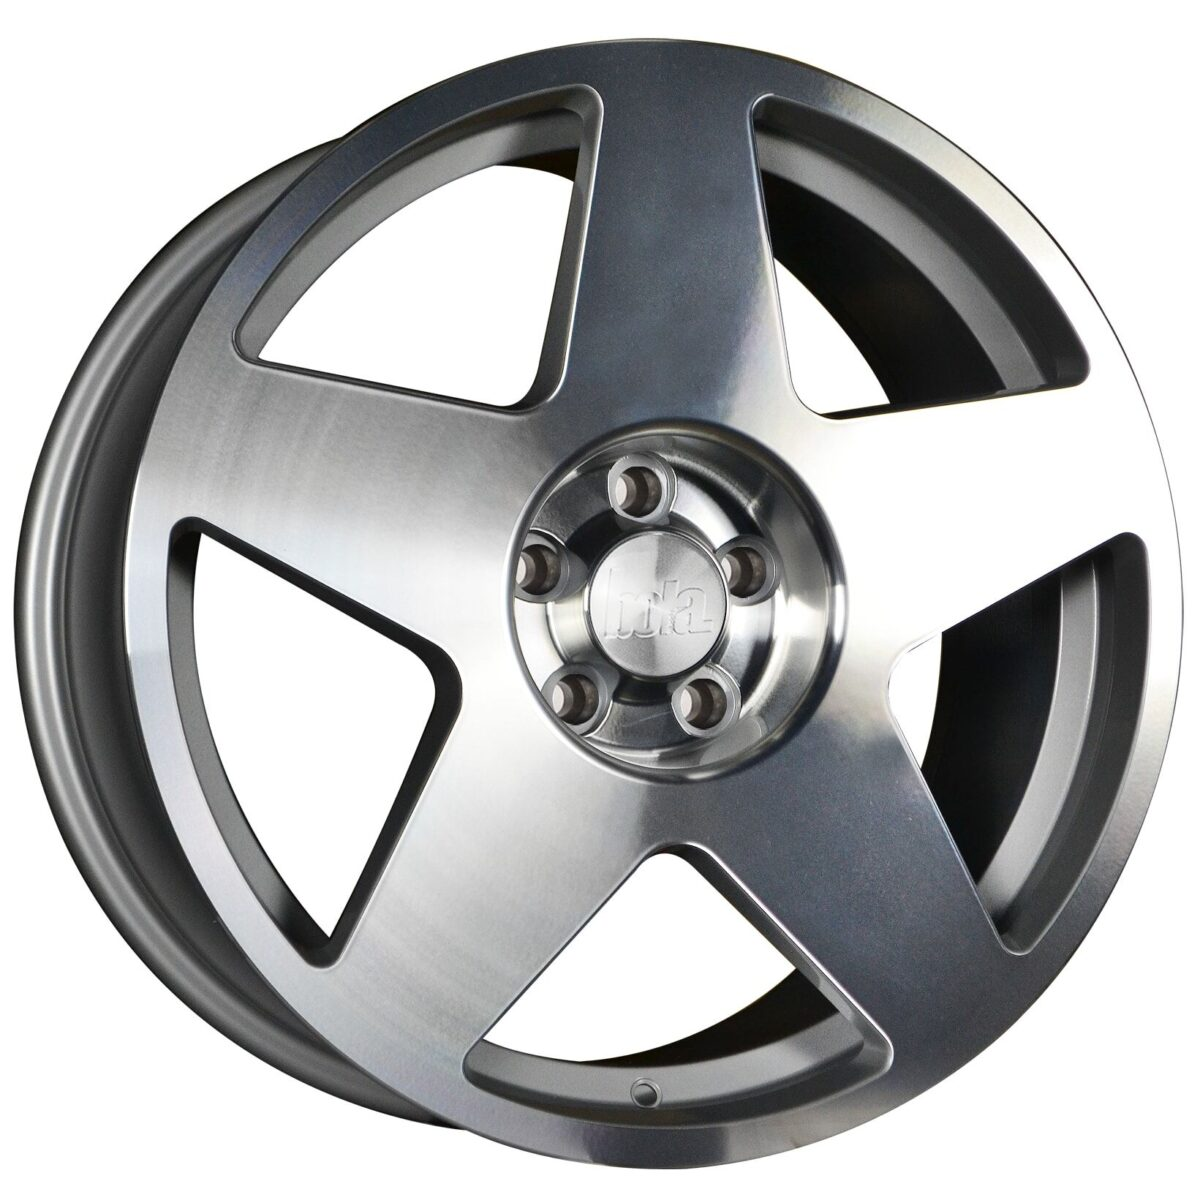 "18"" BOLA B10 Wheels - Silver Polished Face - VW / Audi / Mercedes - 5x112"